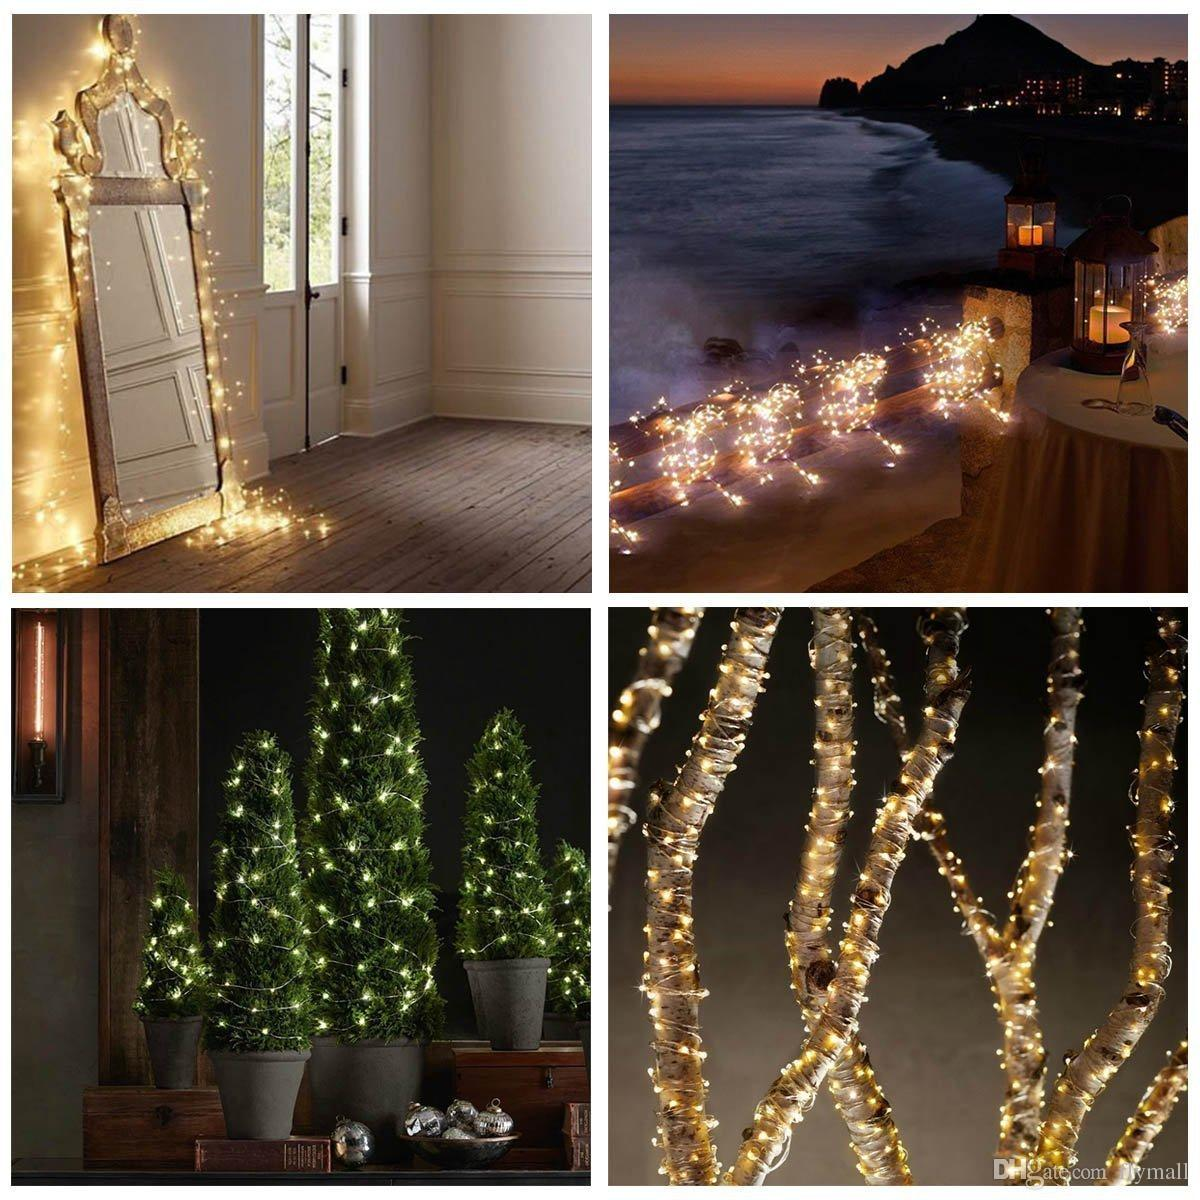 Solar Powered String Light 33ft 100 LEDs Starry String Light Copper Wire String Light Ambiance Lighting for Gardens, Home, Christmas Party